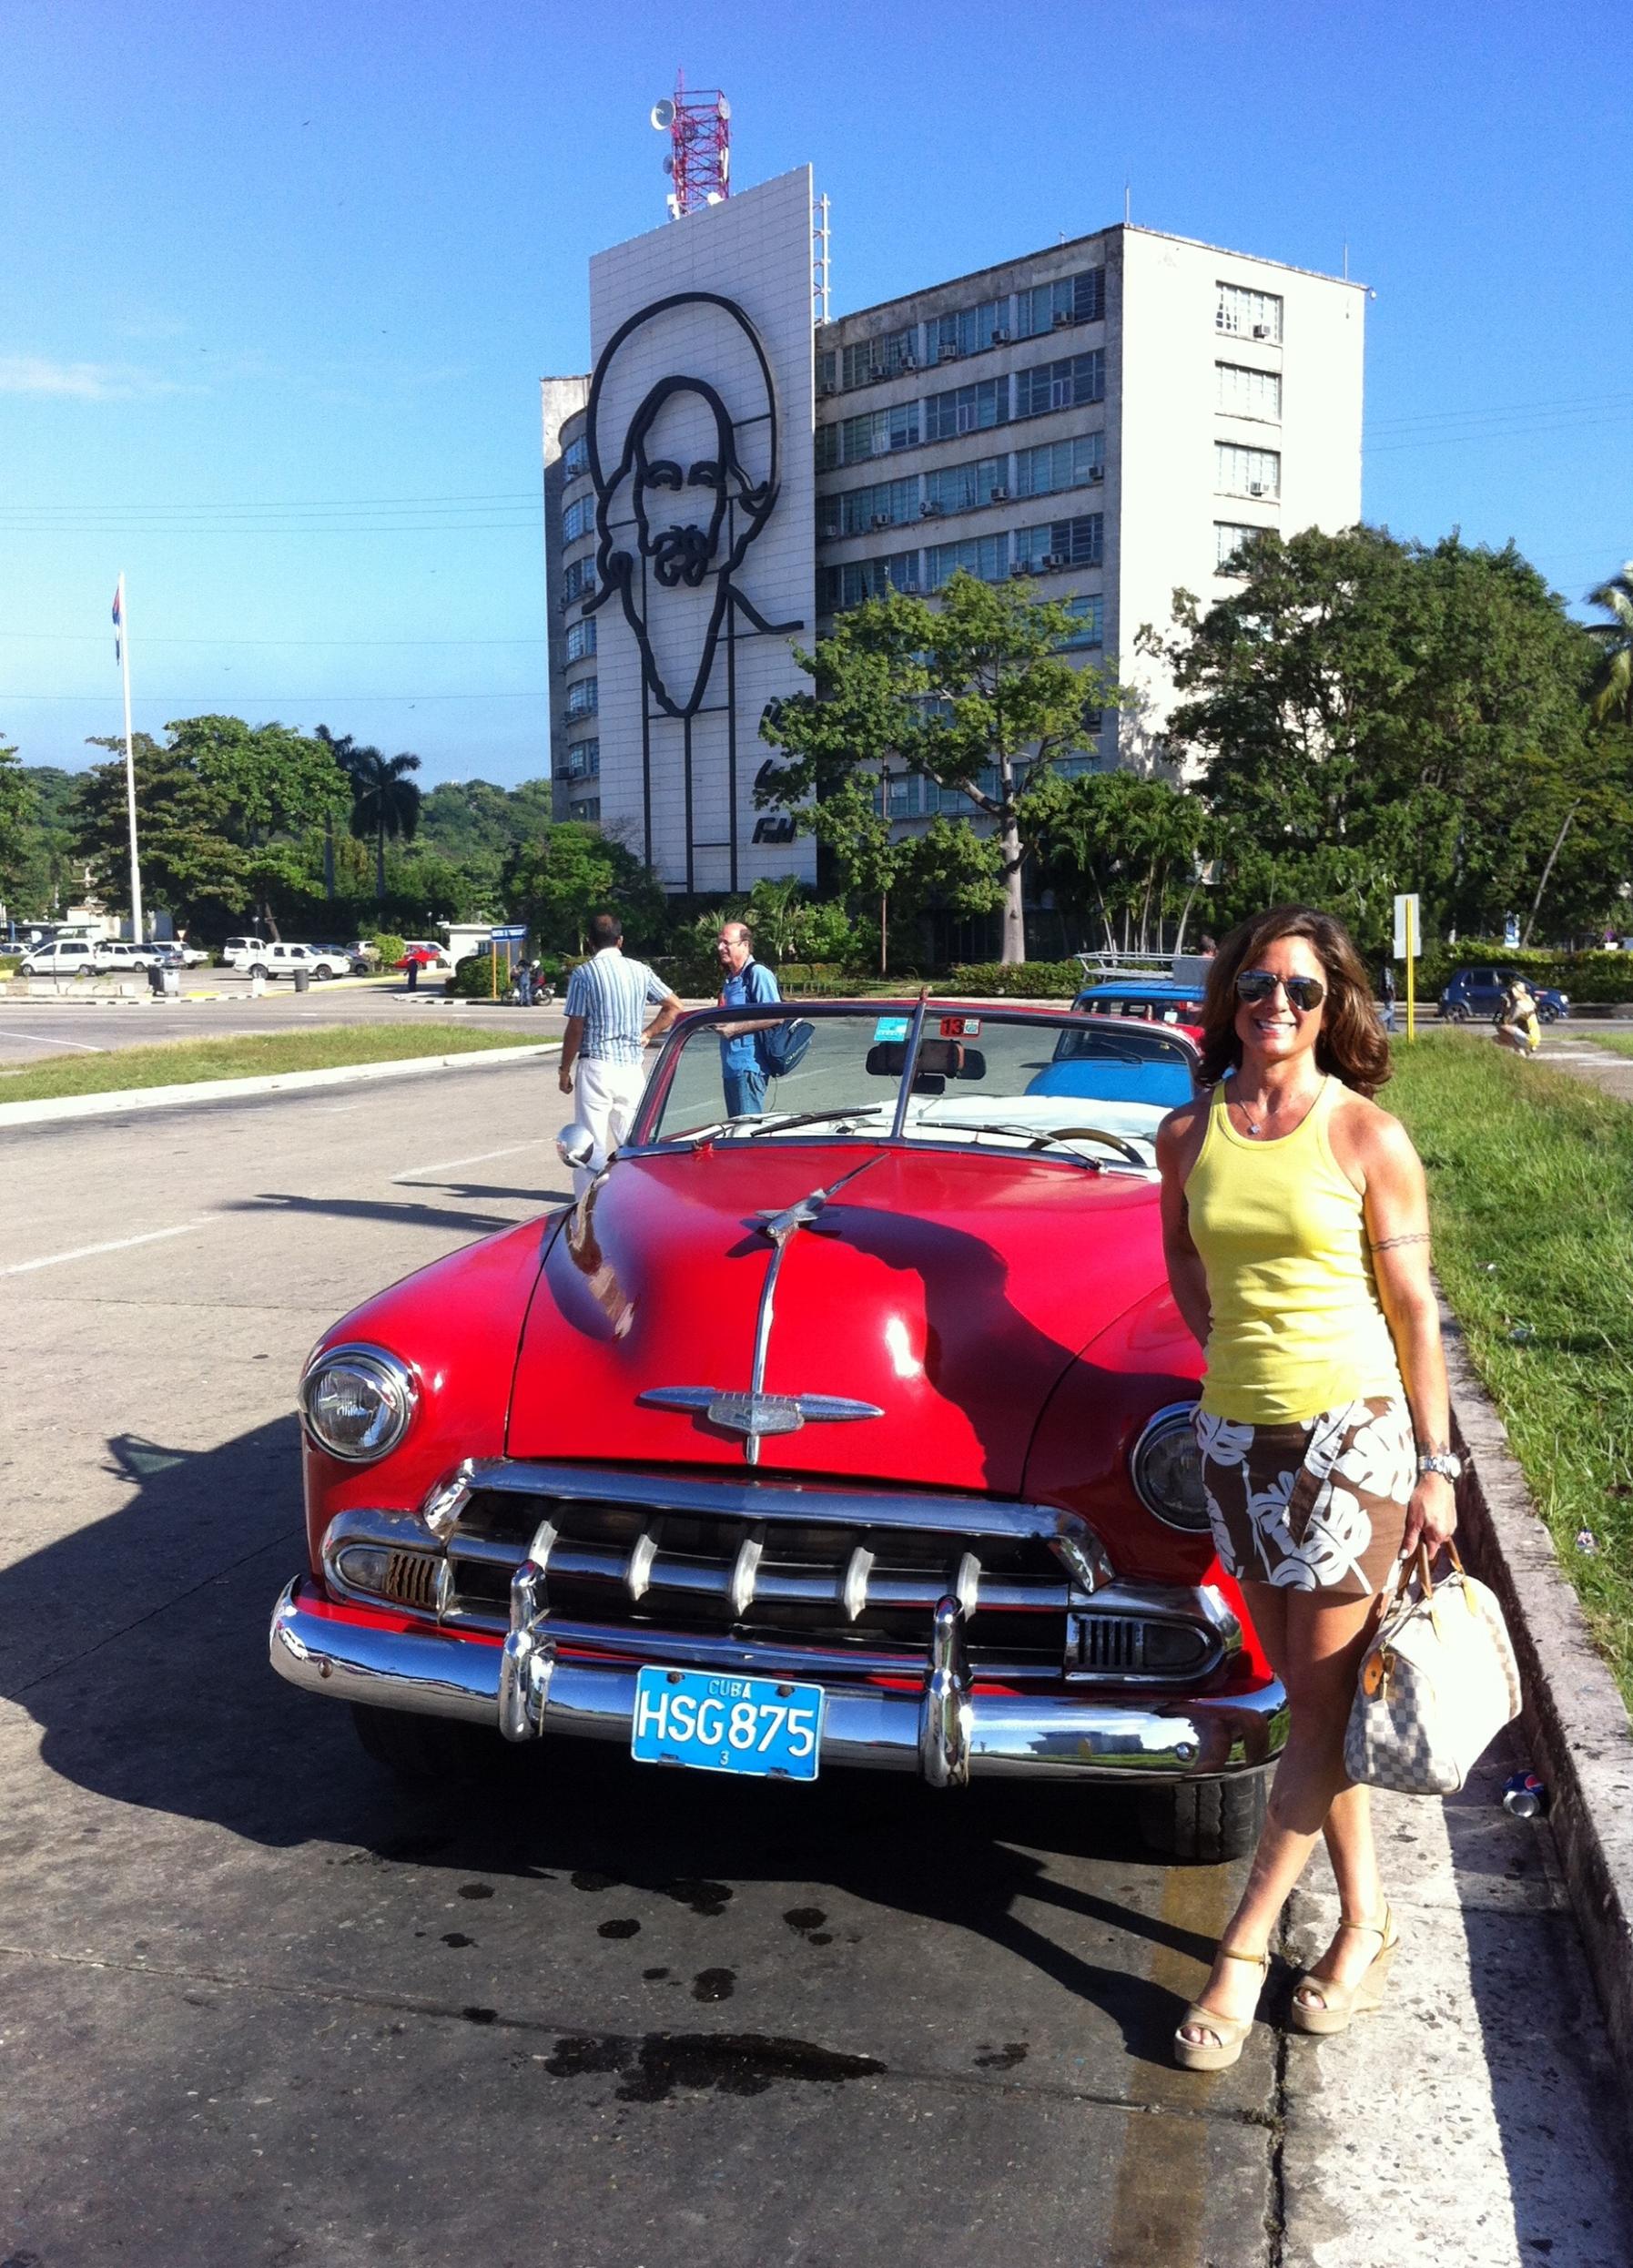 Havana Classic Car and Image of Fidel Castro